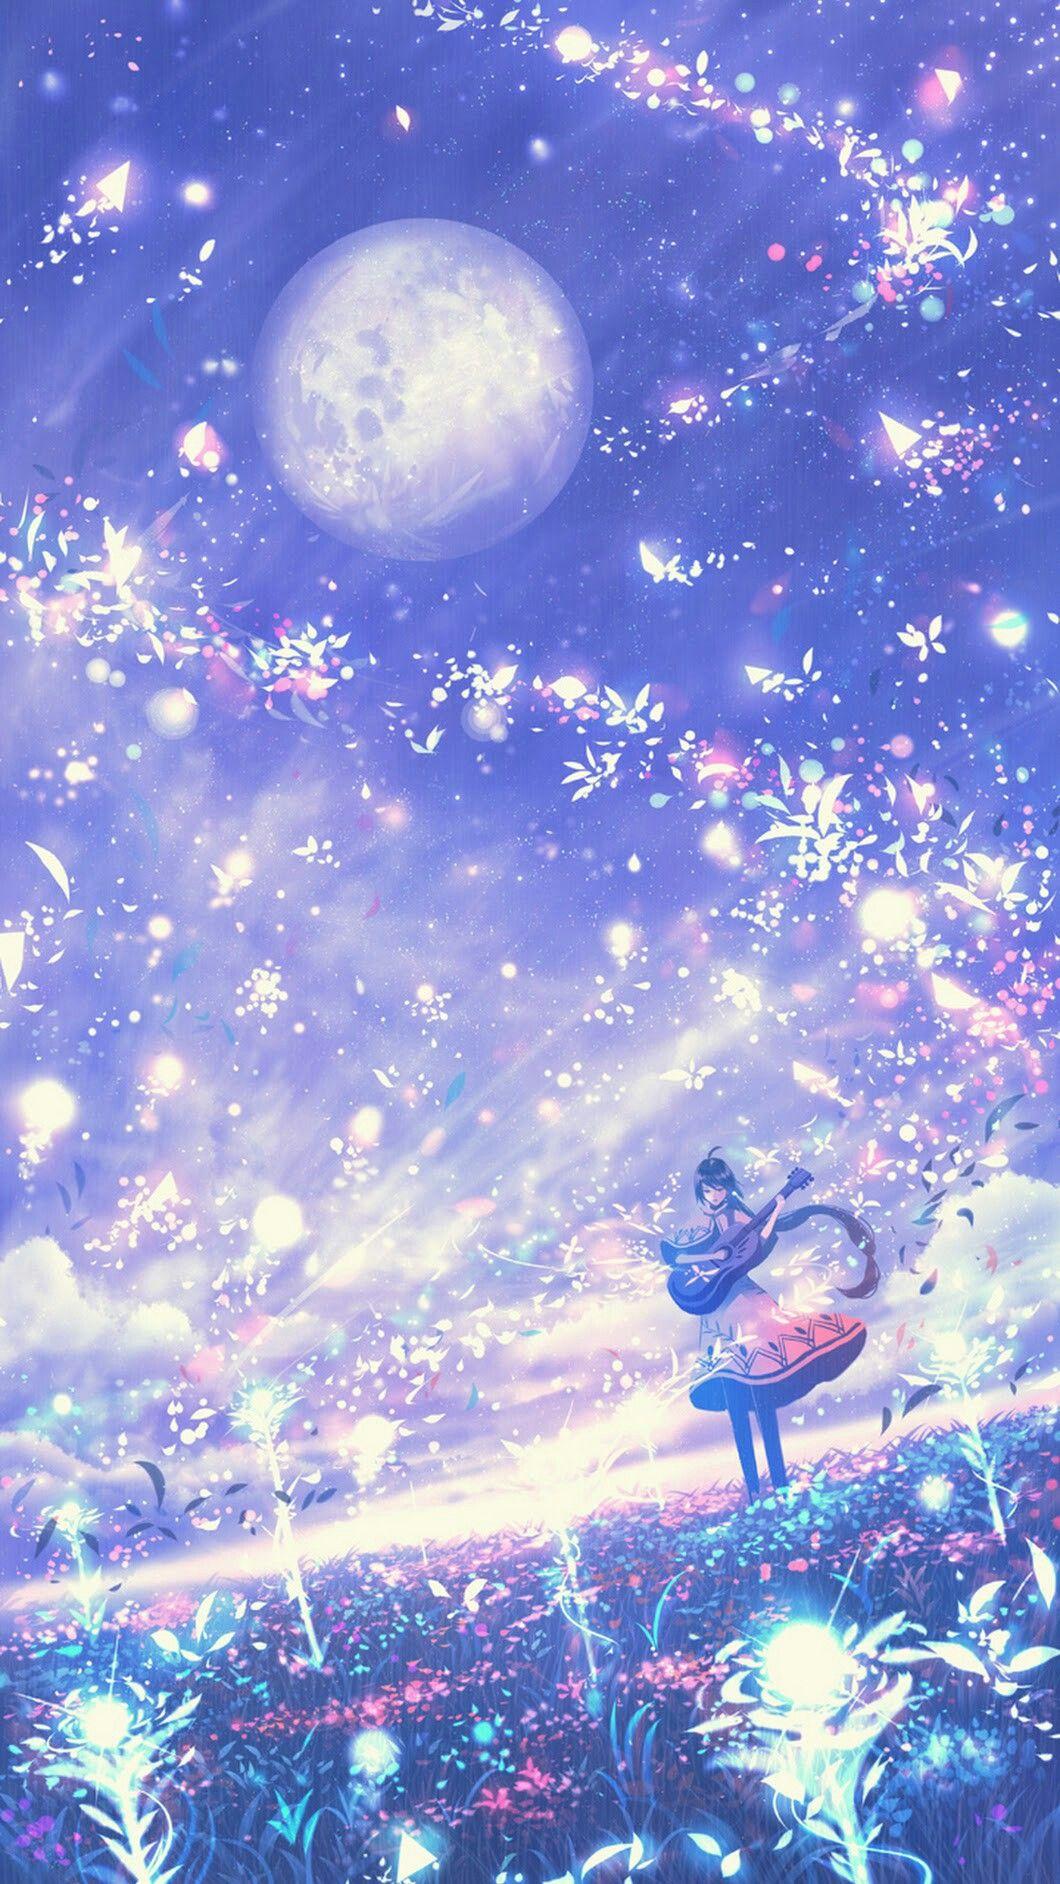 Pin By Kurumi On Anime Anime Scenery Wallpaper Anime Scenery Cute Galaxy Wallpaper